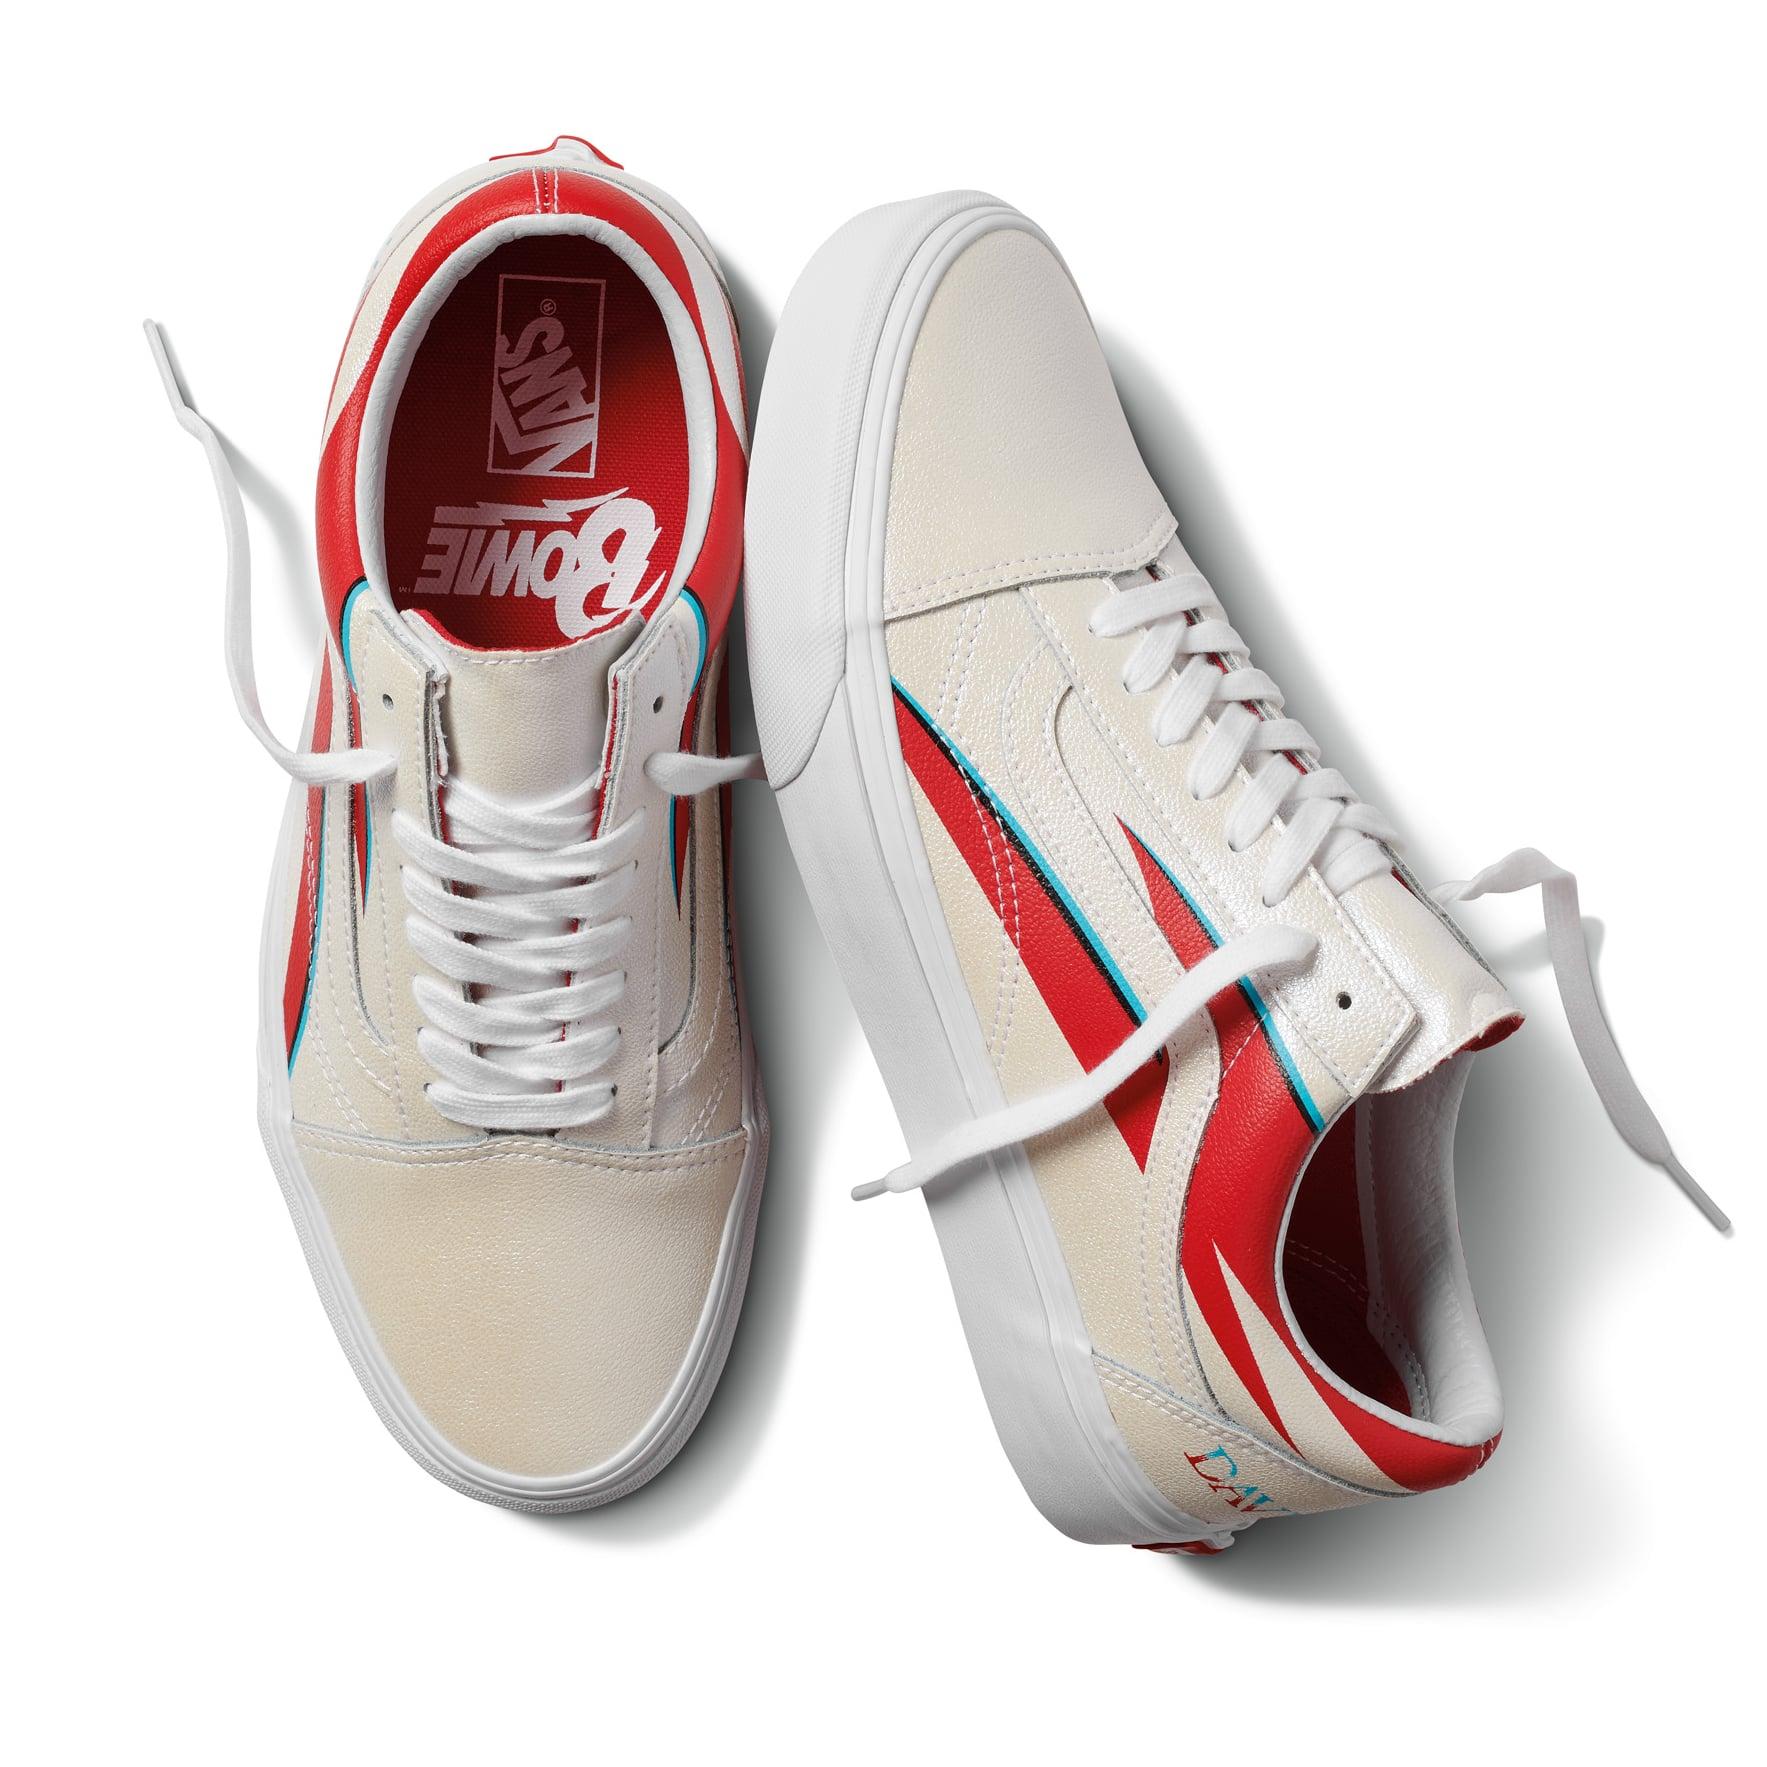 Vans David Bowie Sneaker Collection